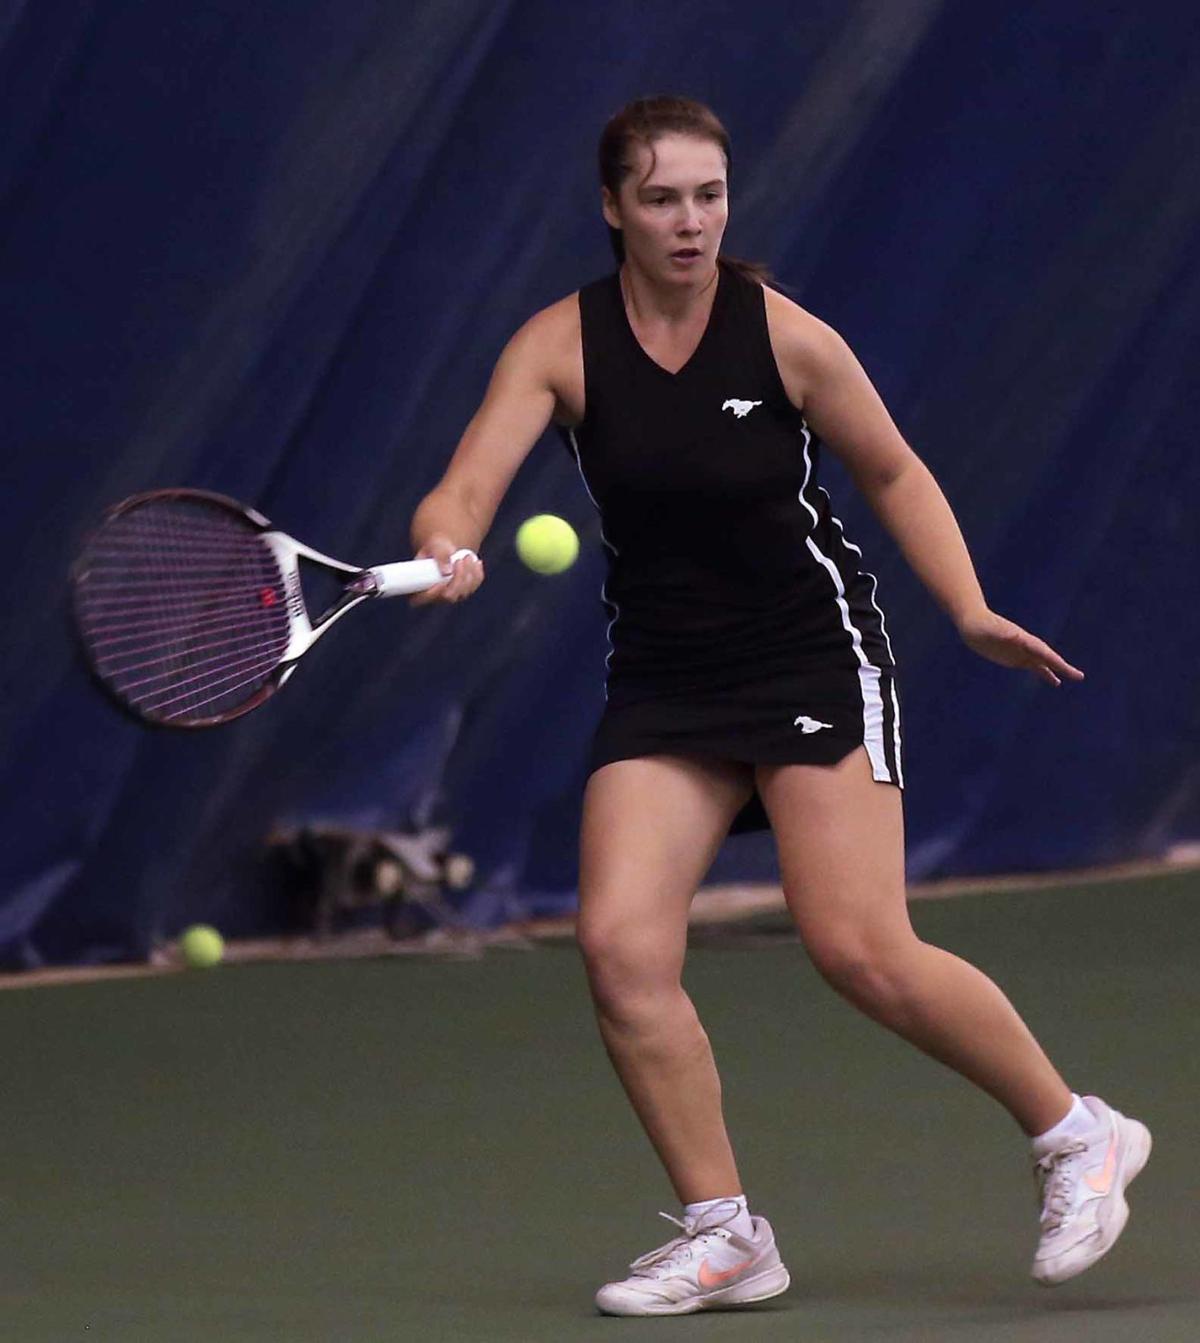 2019_10_03 YAIAA tennis day one Hynson SWHS 2_edited-1.jpg